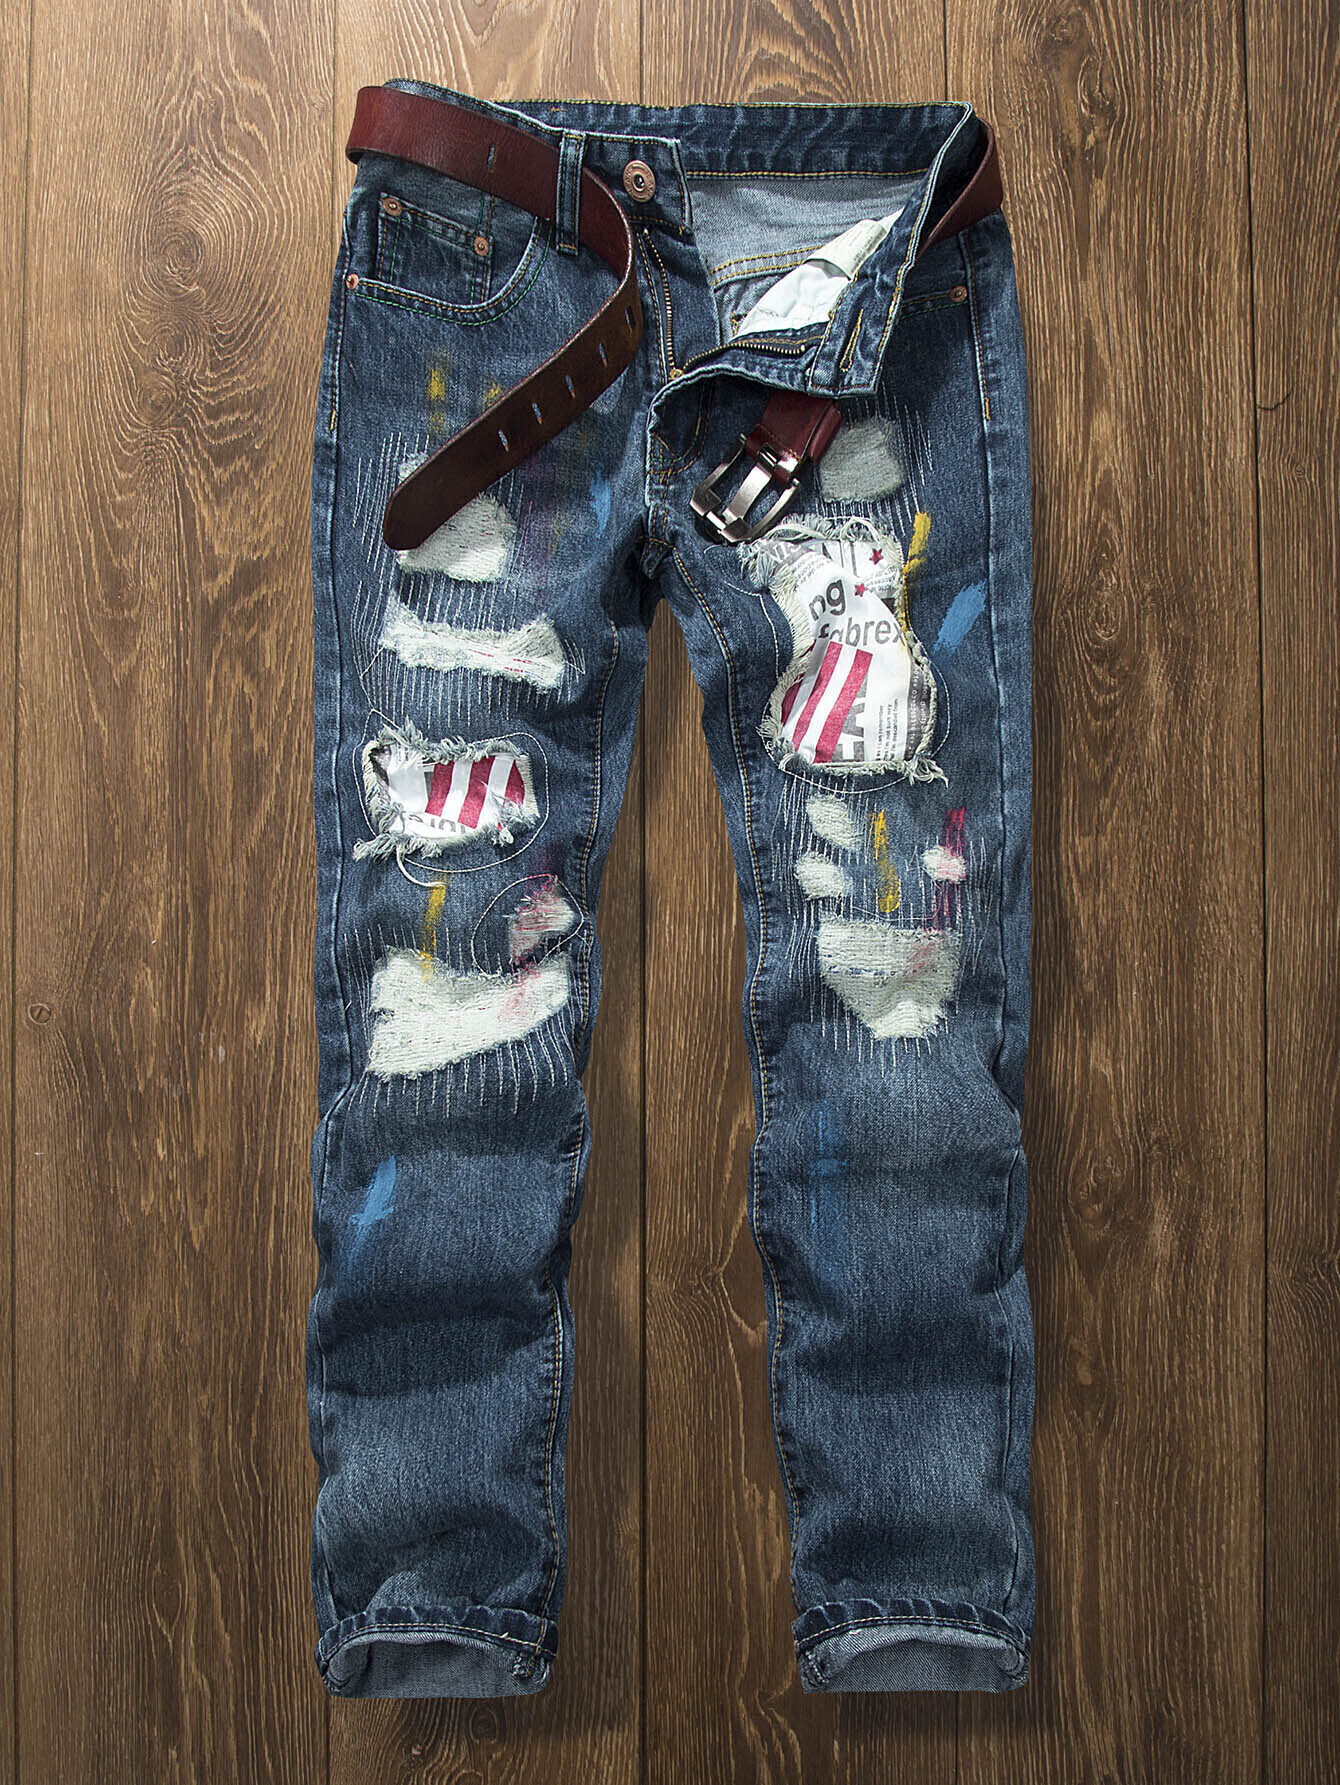 Men Biker Jeans With Patches rl629 men s blue jeans slim fit denim ripped pants uomo high quality designer brand clothing moto biker jeans with logo men